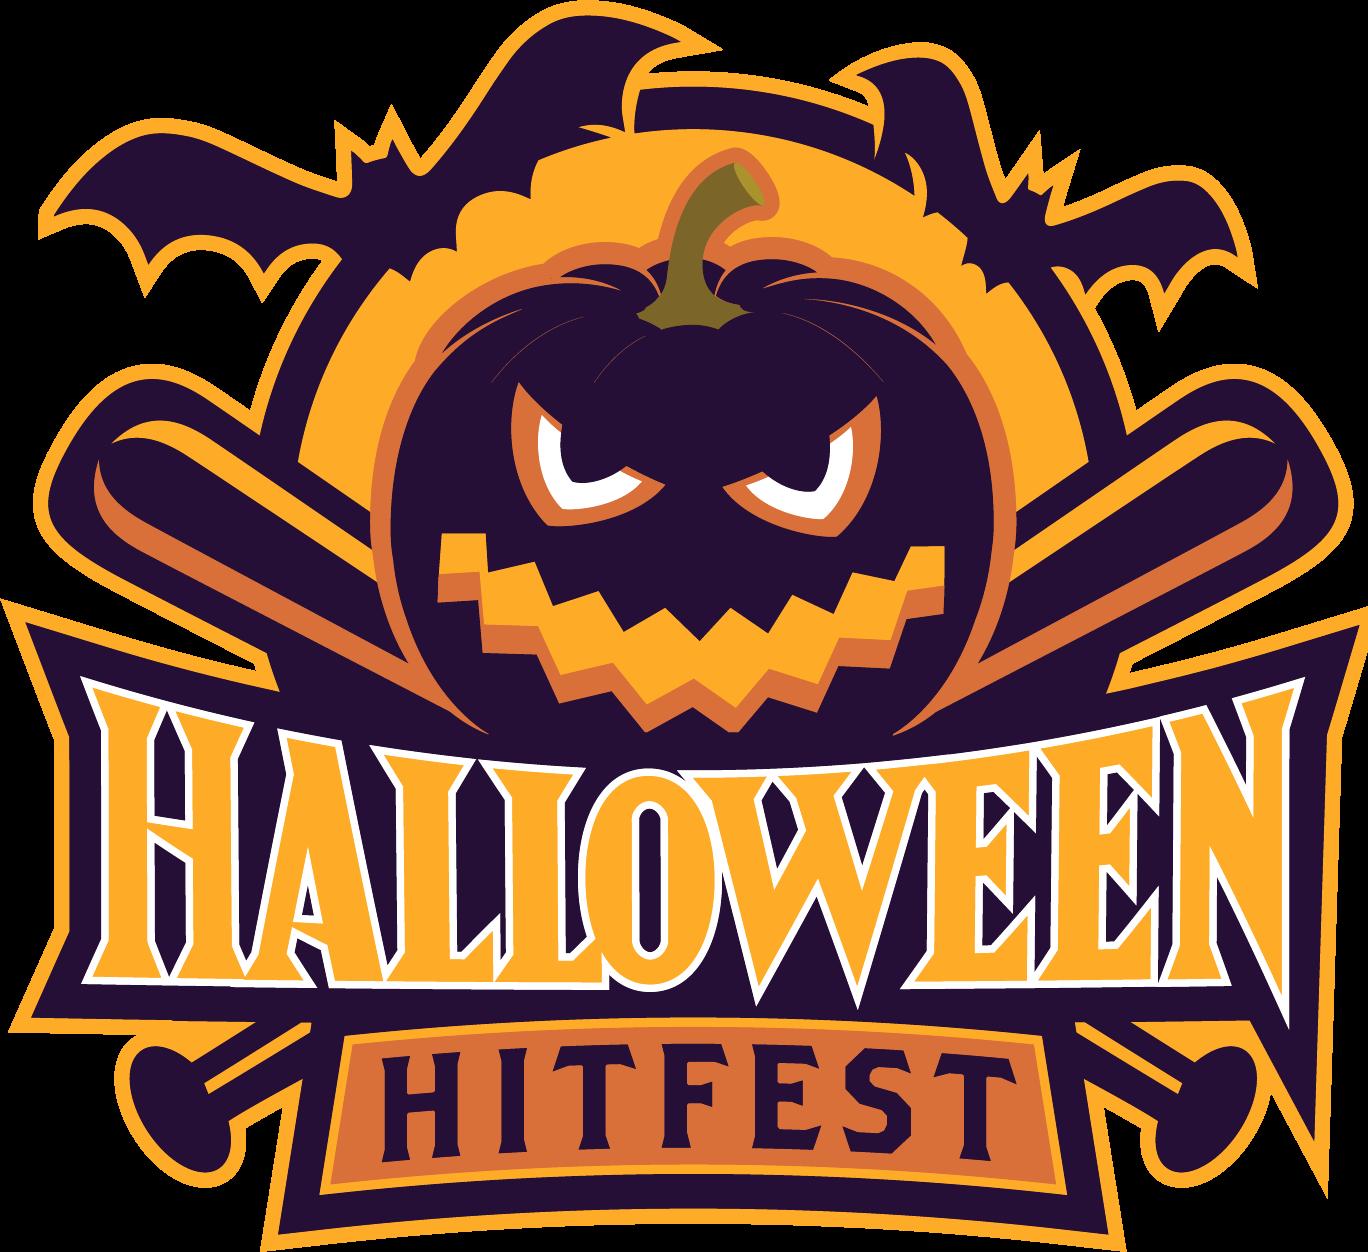 Creekside Halloween Hitfest